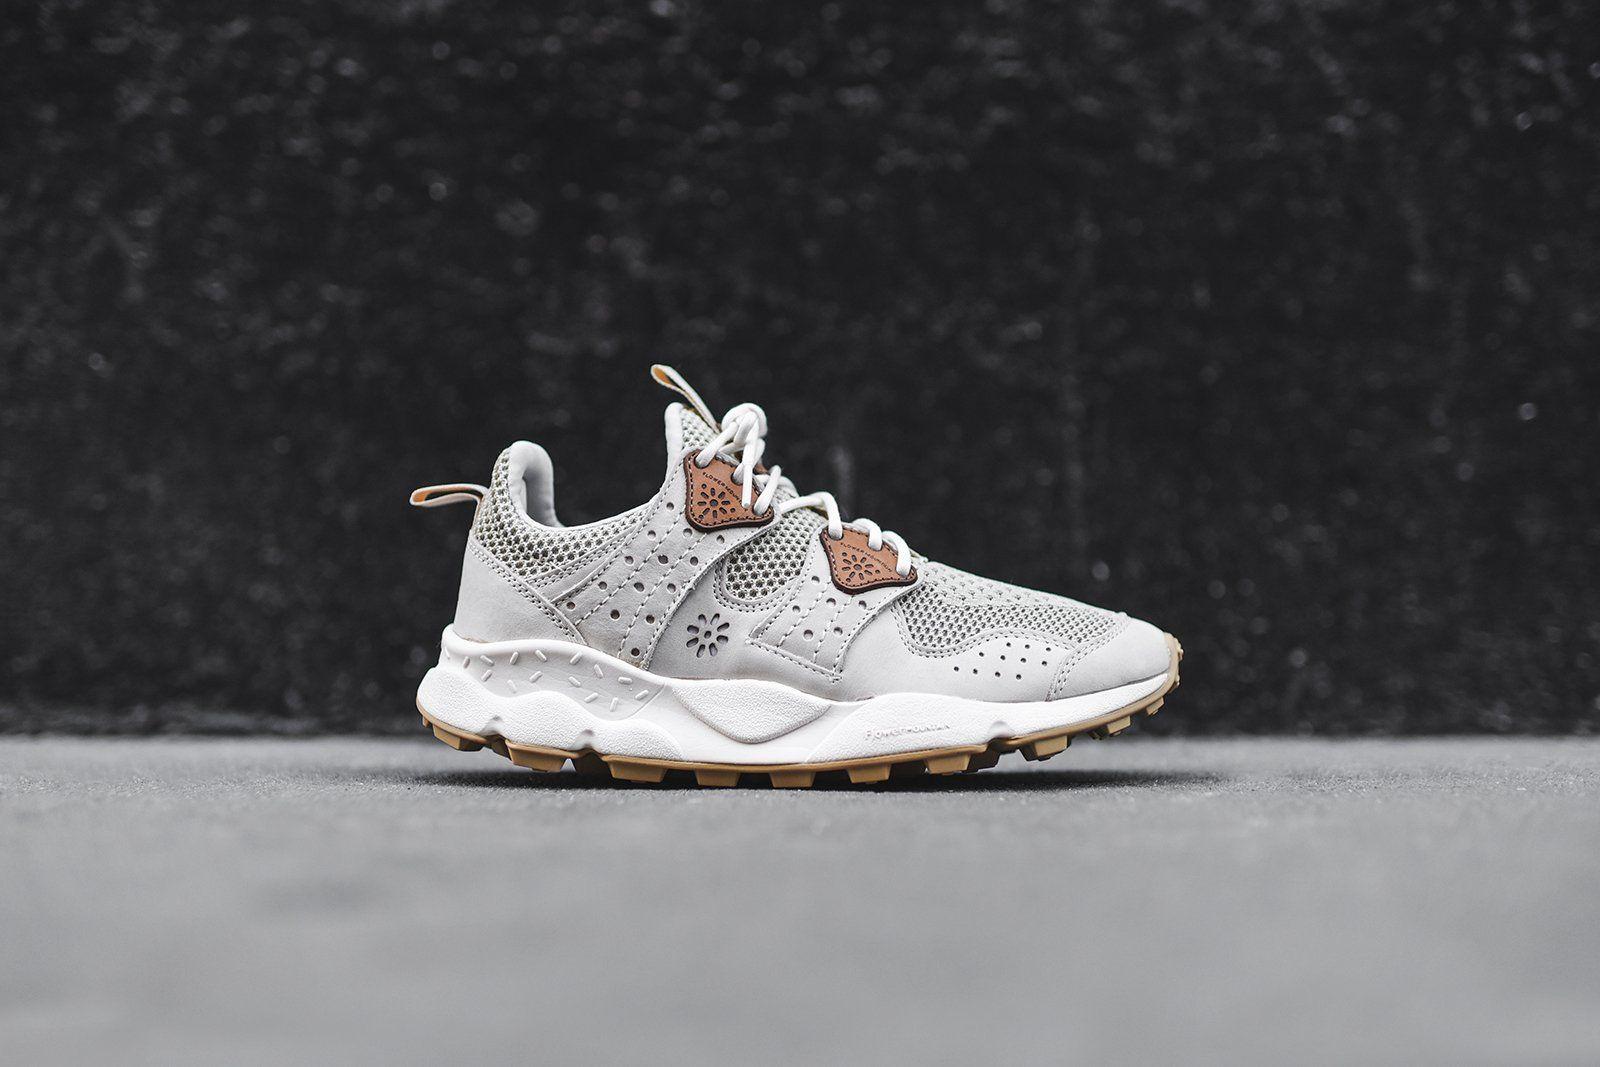 NikeFootwear Off Corax Flower Mountain WhiteSneakers LpSzqUMVG